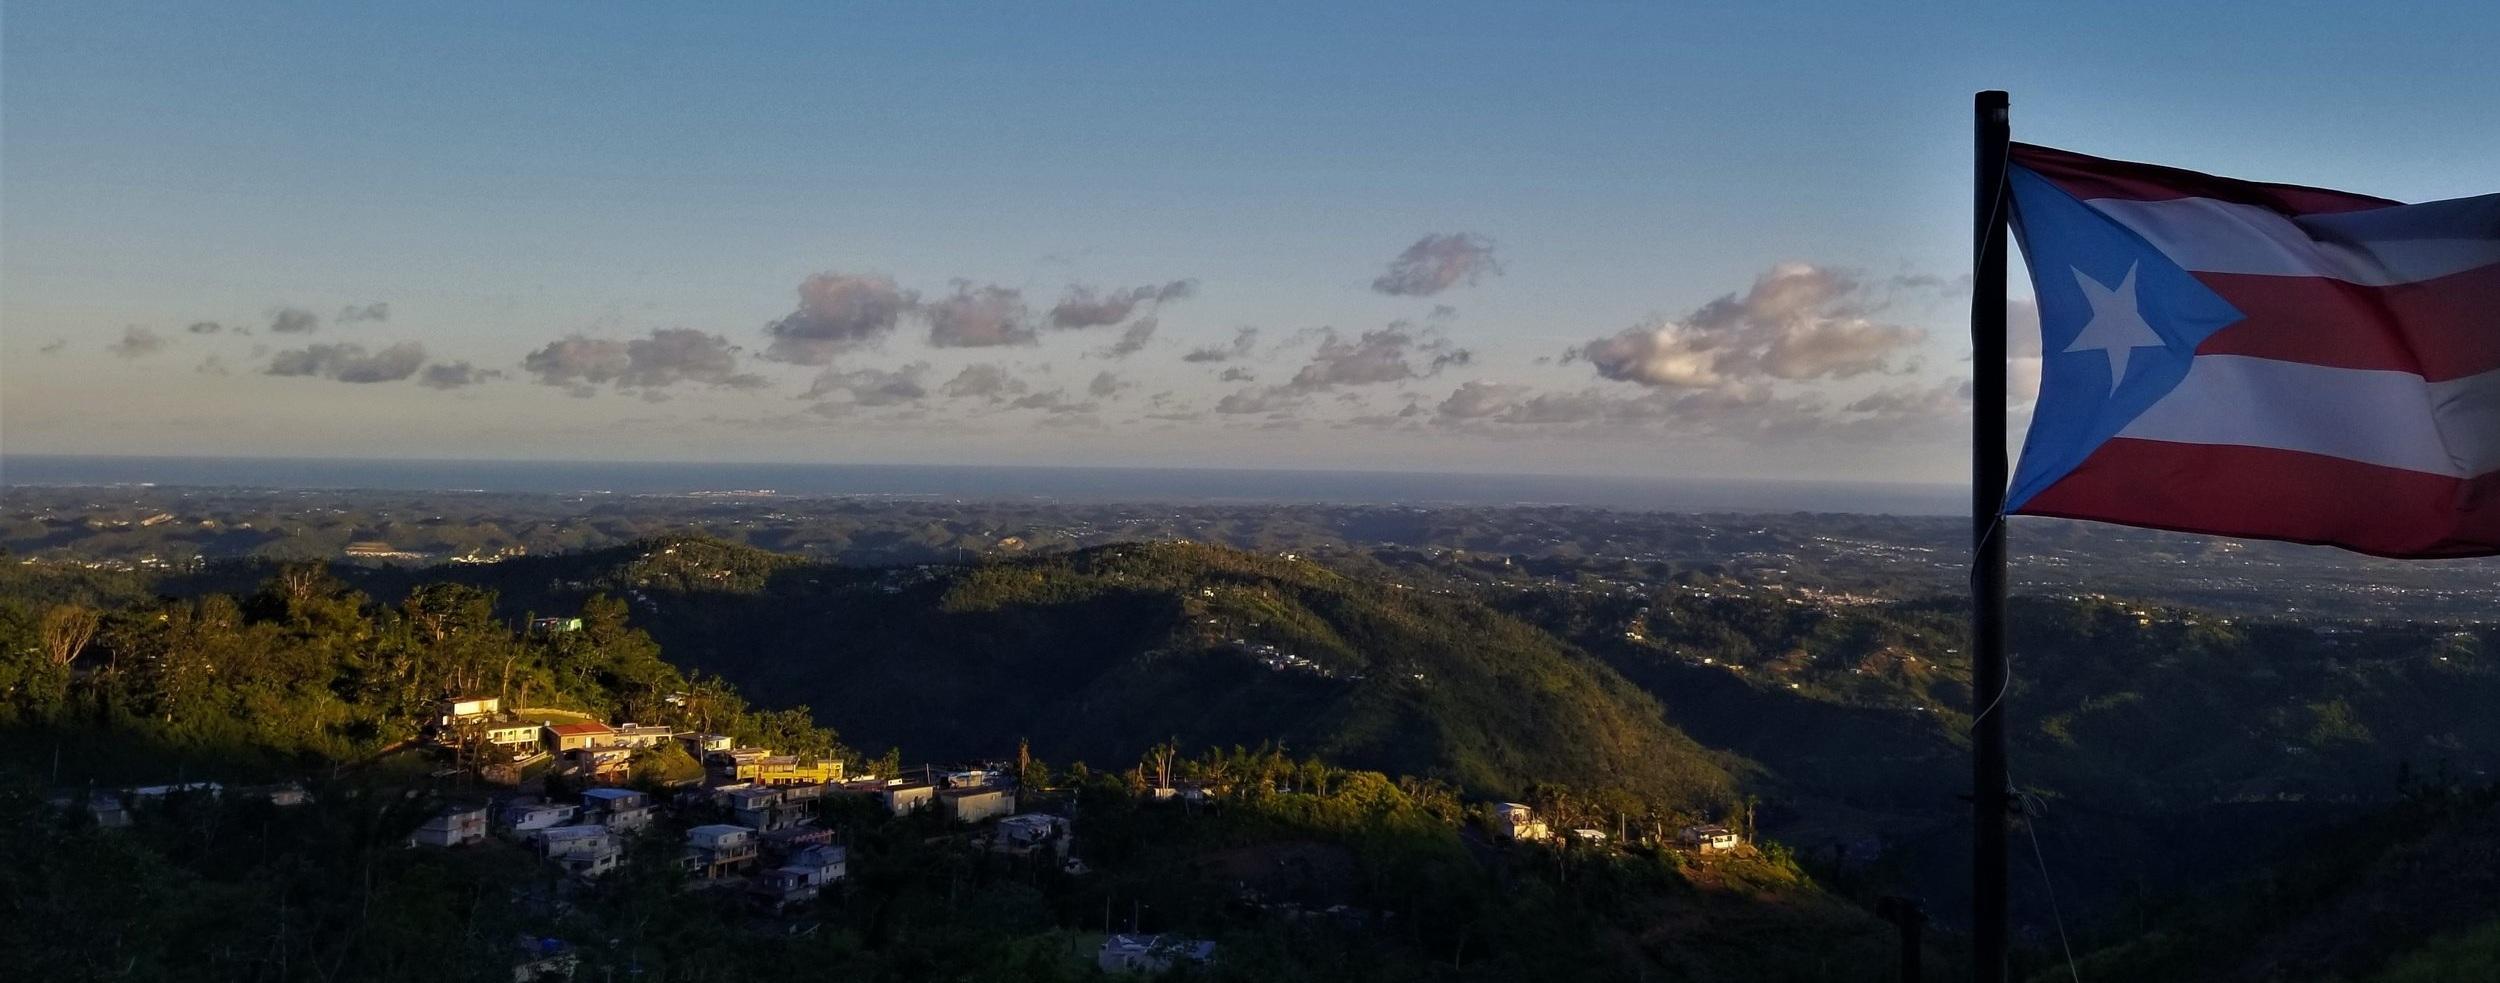 PuertoRicoView.jpg